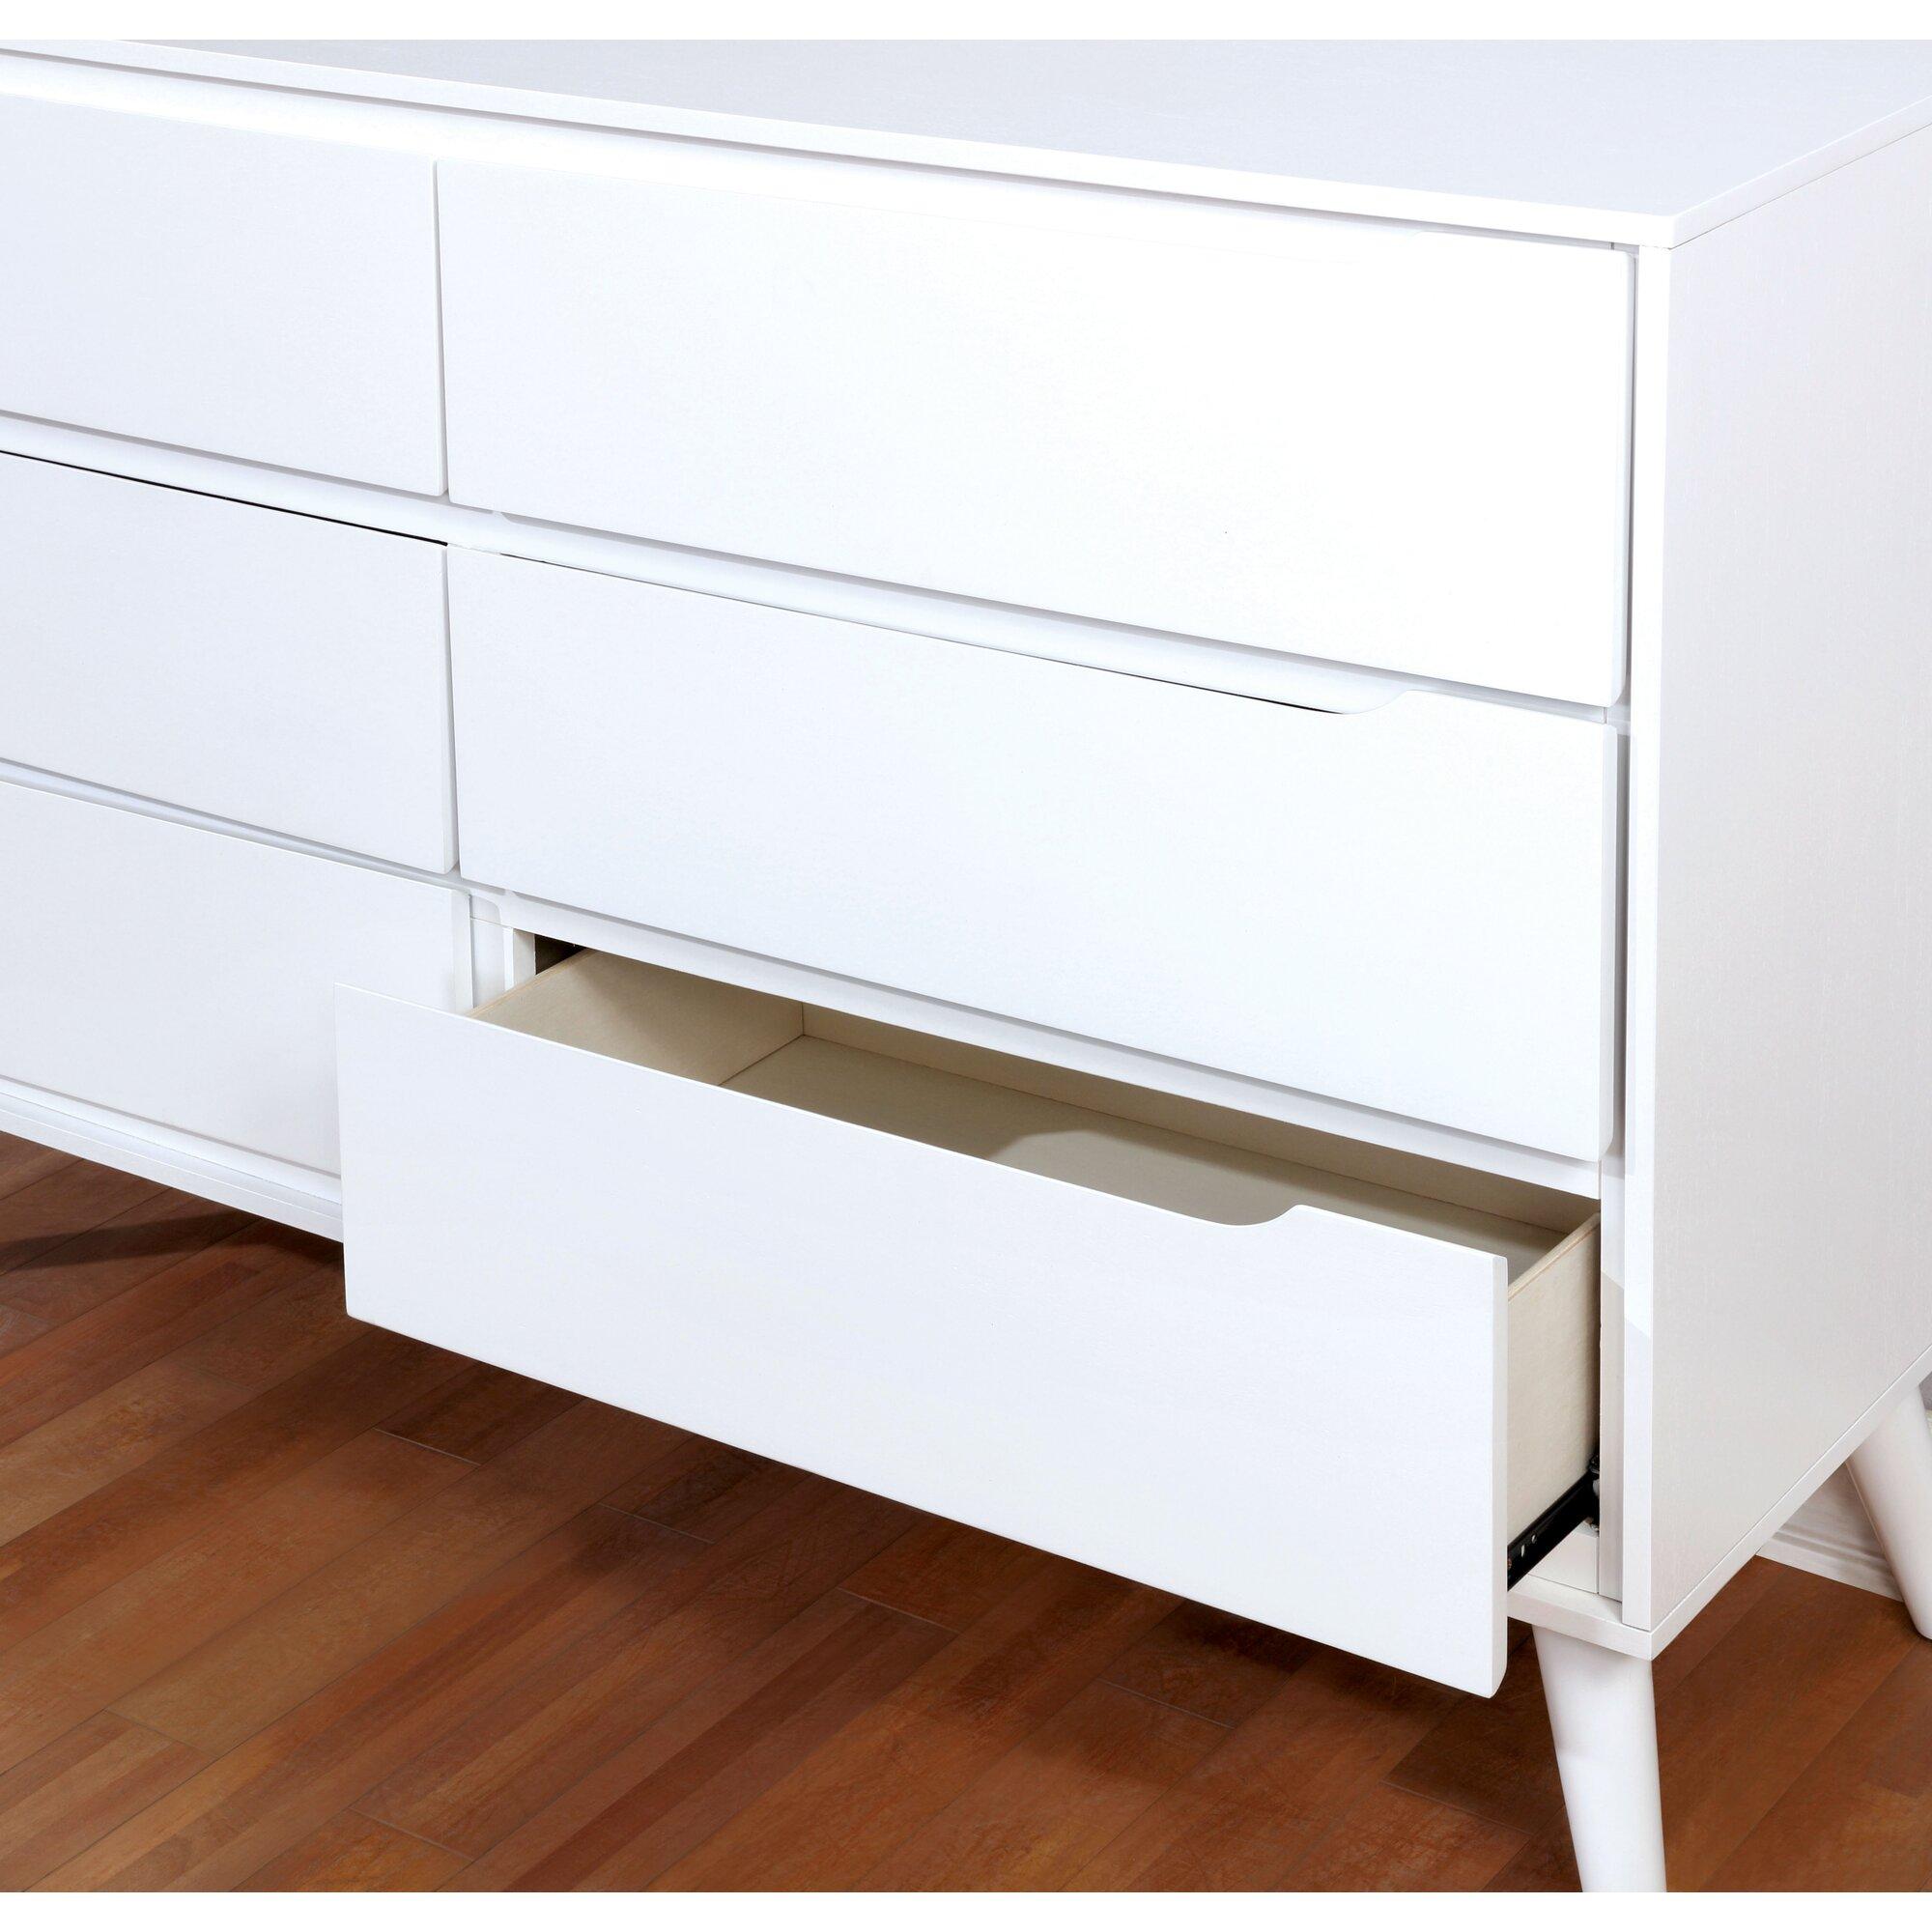 polick midcentury modern  drawer dresser  reviews  allmodern - polick midcentury modern  drawer dresser